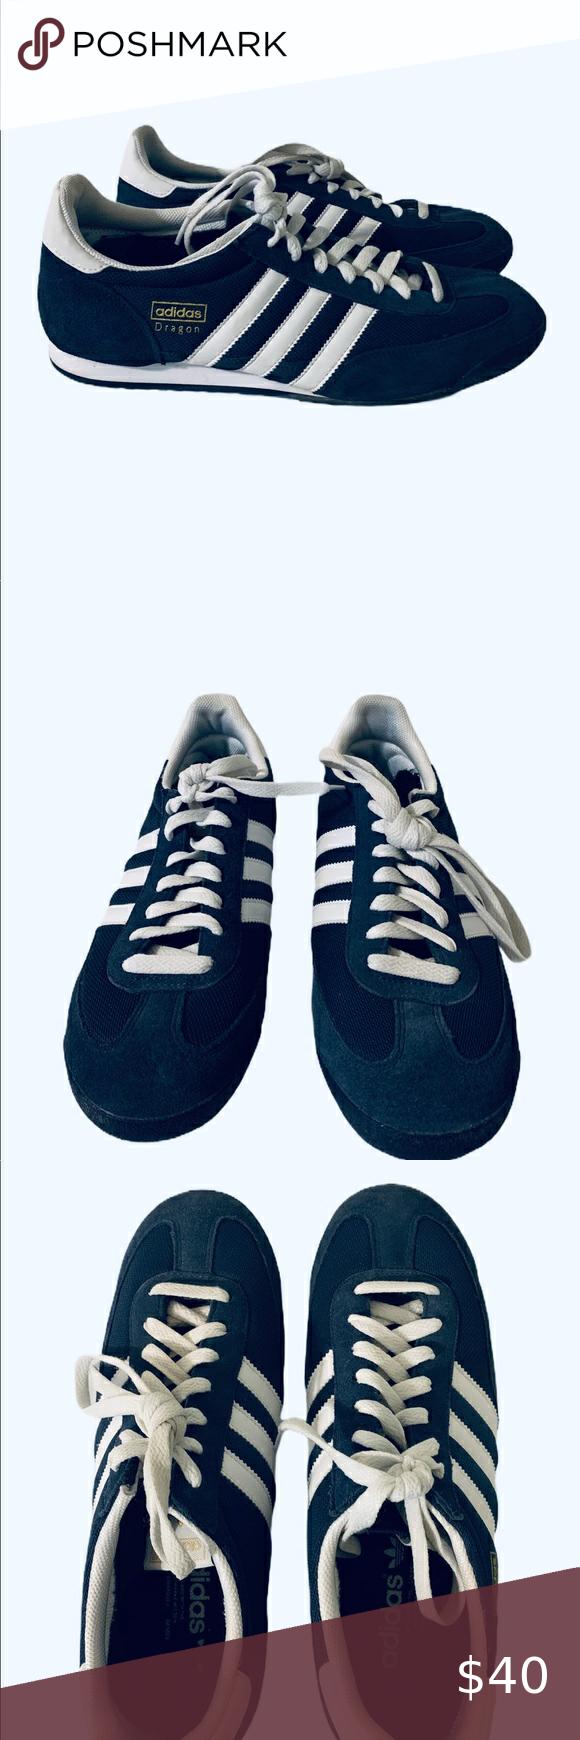 Adidas Dragon navy blue men's sneakers   Adidas dragon, Sneakers ...